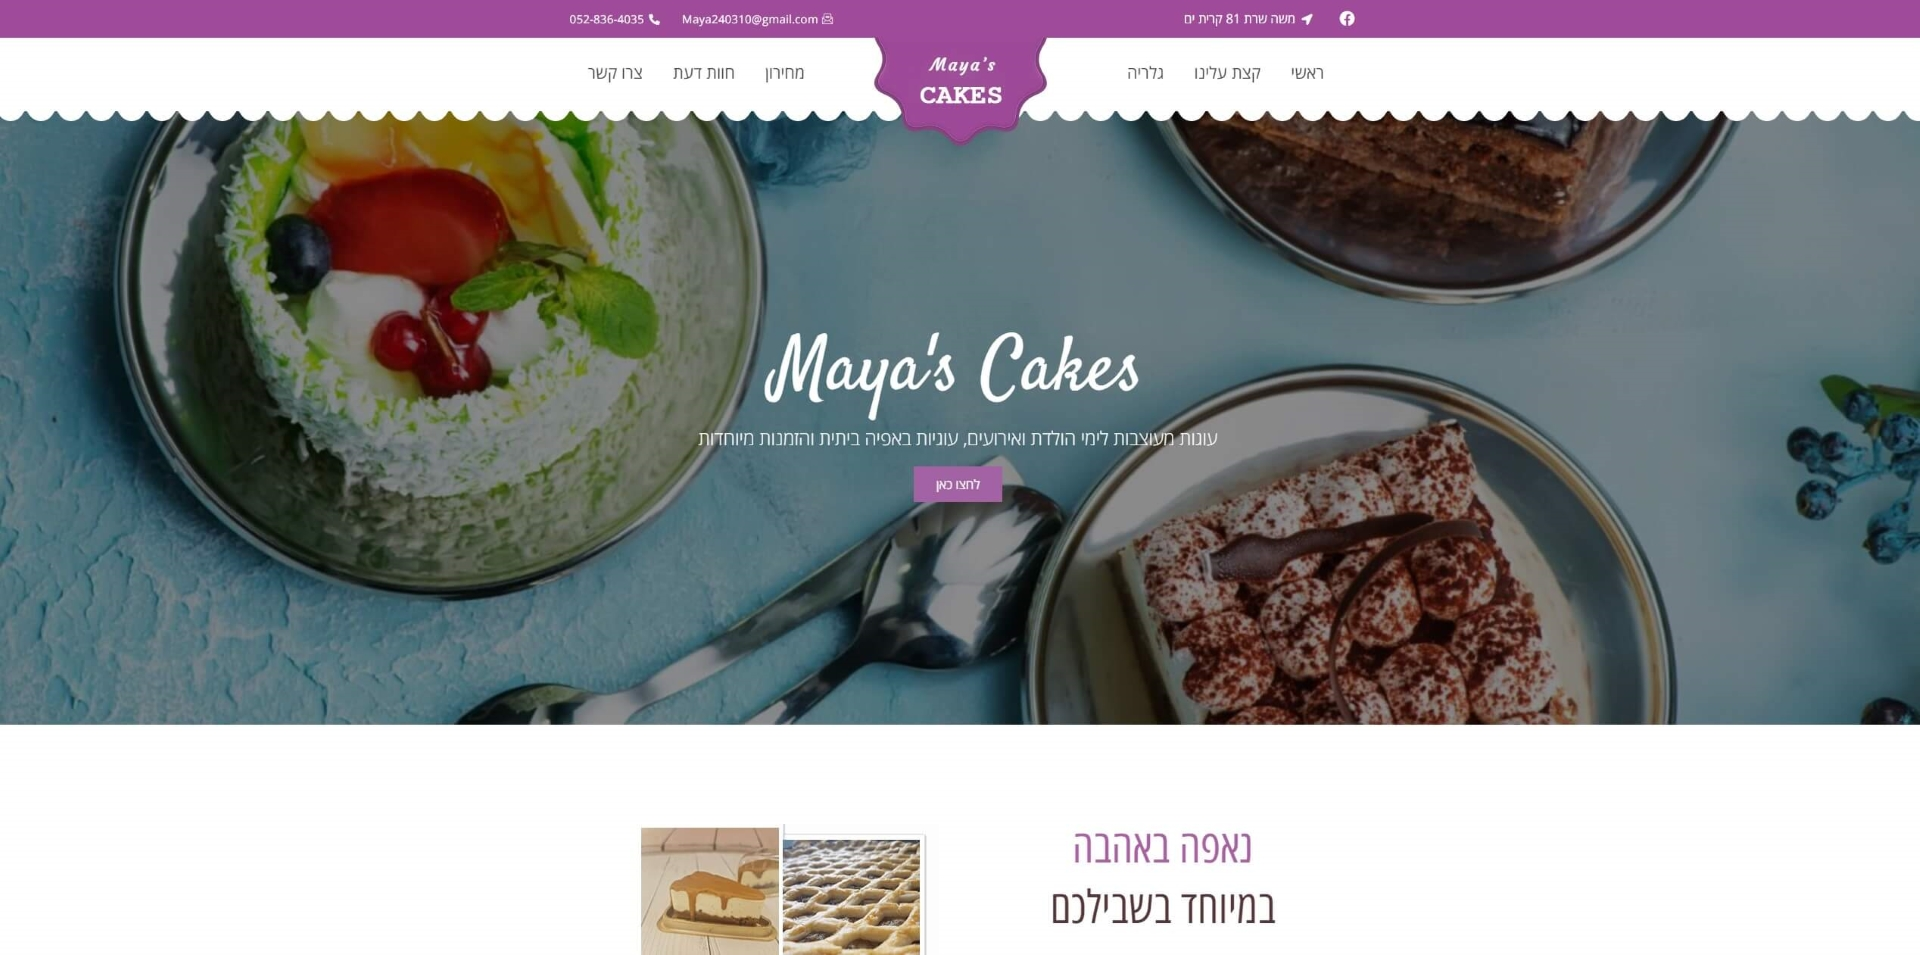 Maya's Cakes | עוגות בהזמנה אישית